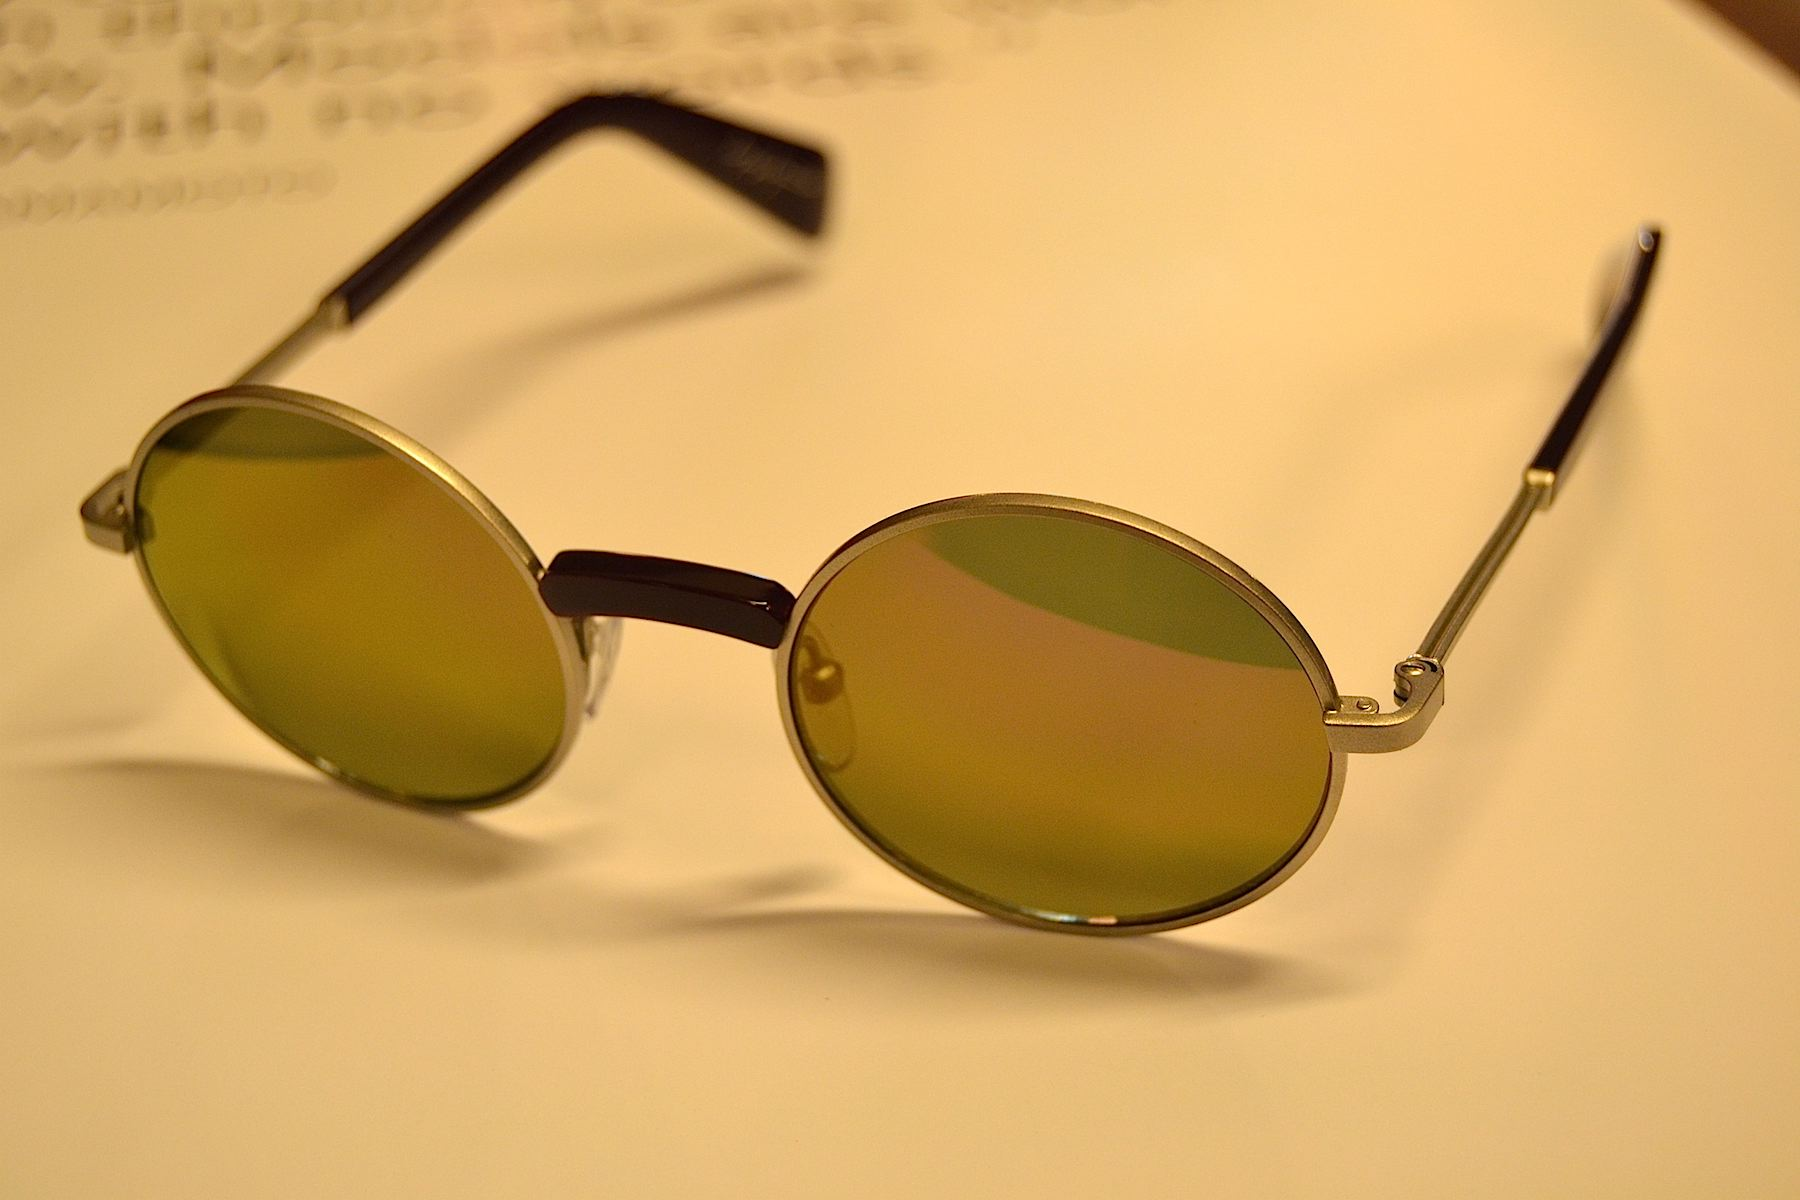 lenastore-bergamo-lenafashion-shop-online-yohji-yamamoto-gli-occhiali-sunglasses-18